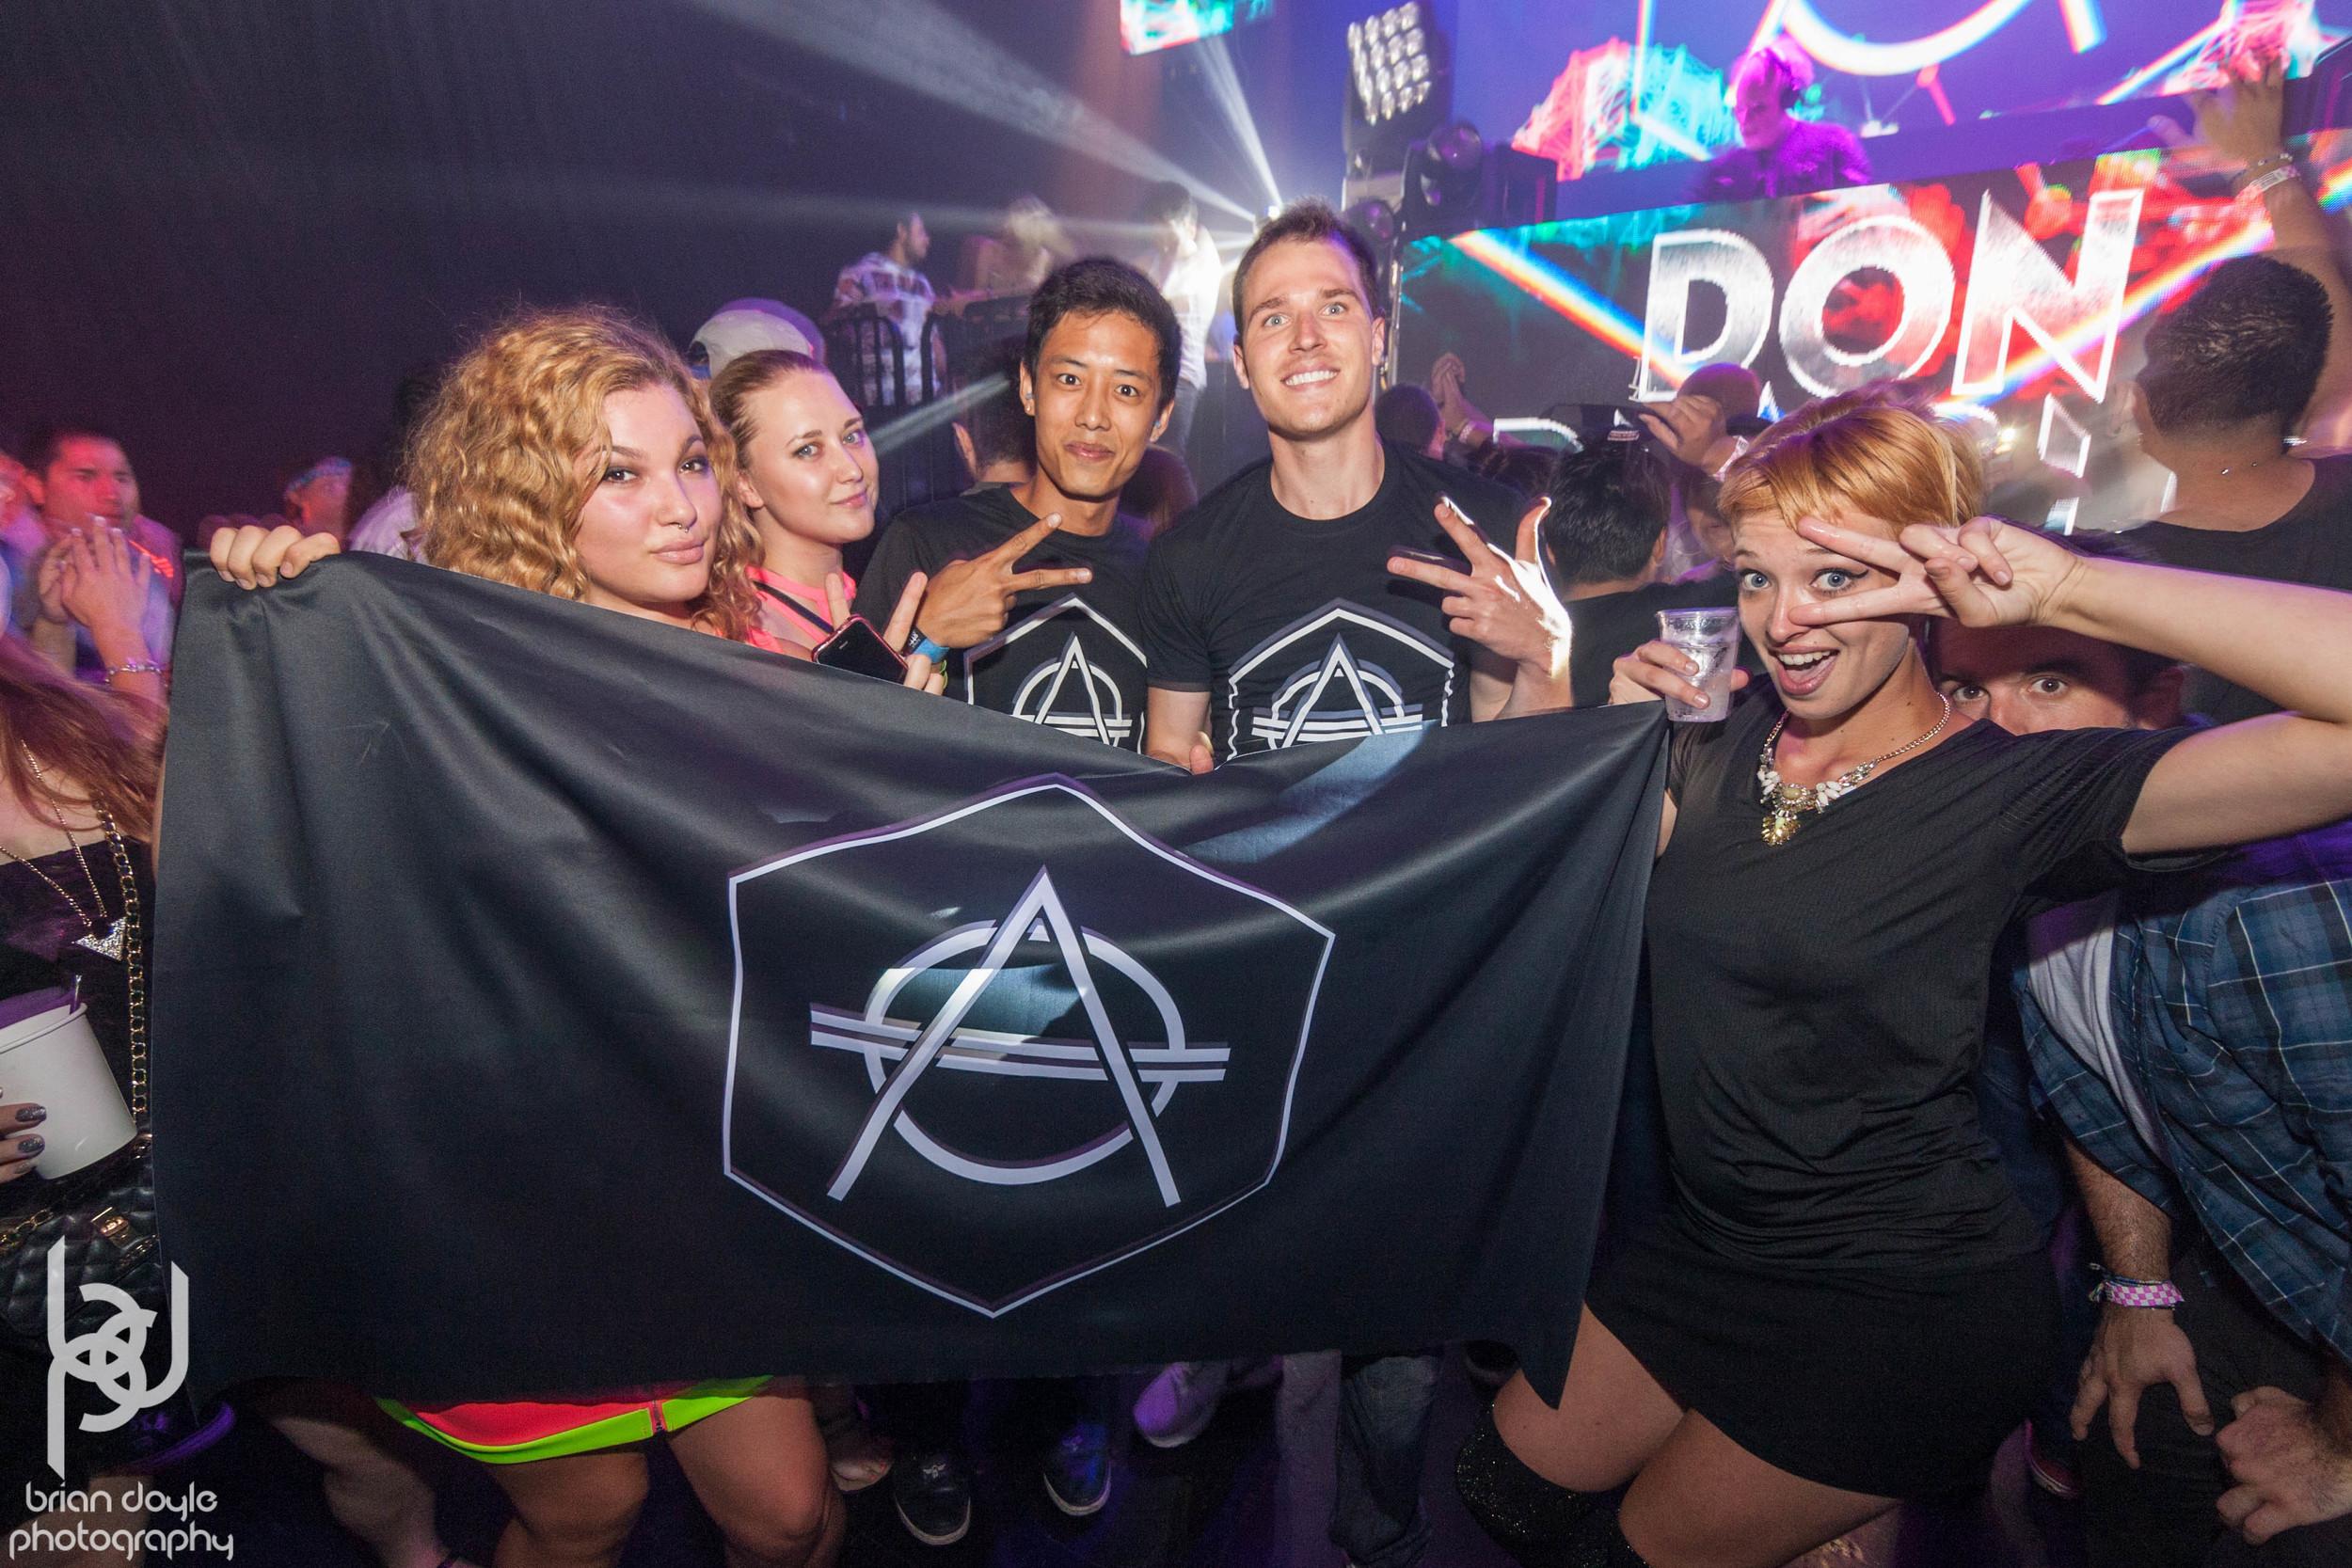 Don Diablo at Avalon bdp 20140908-44.jpg